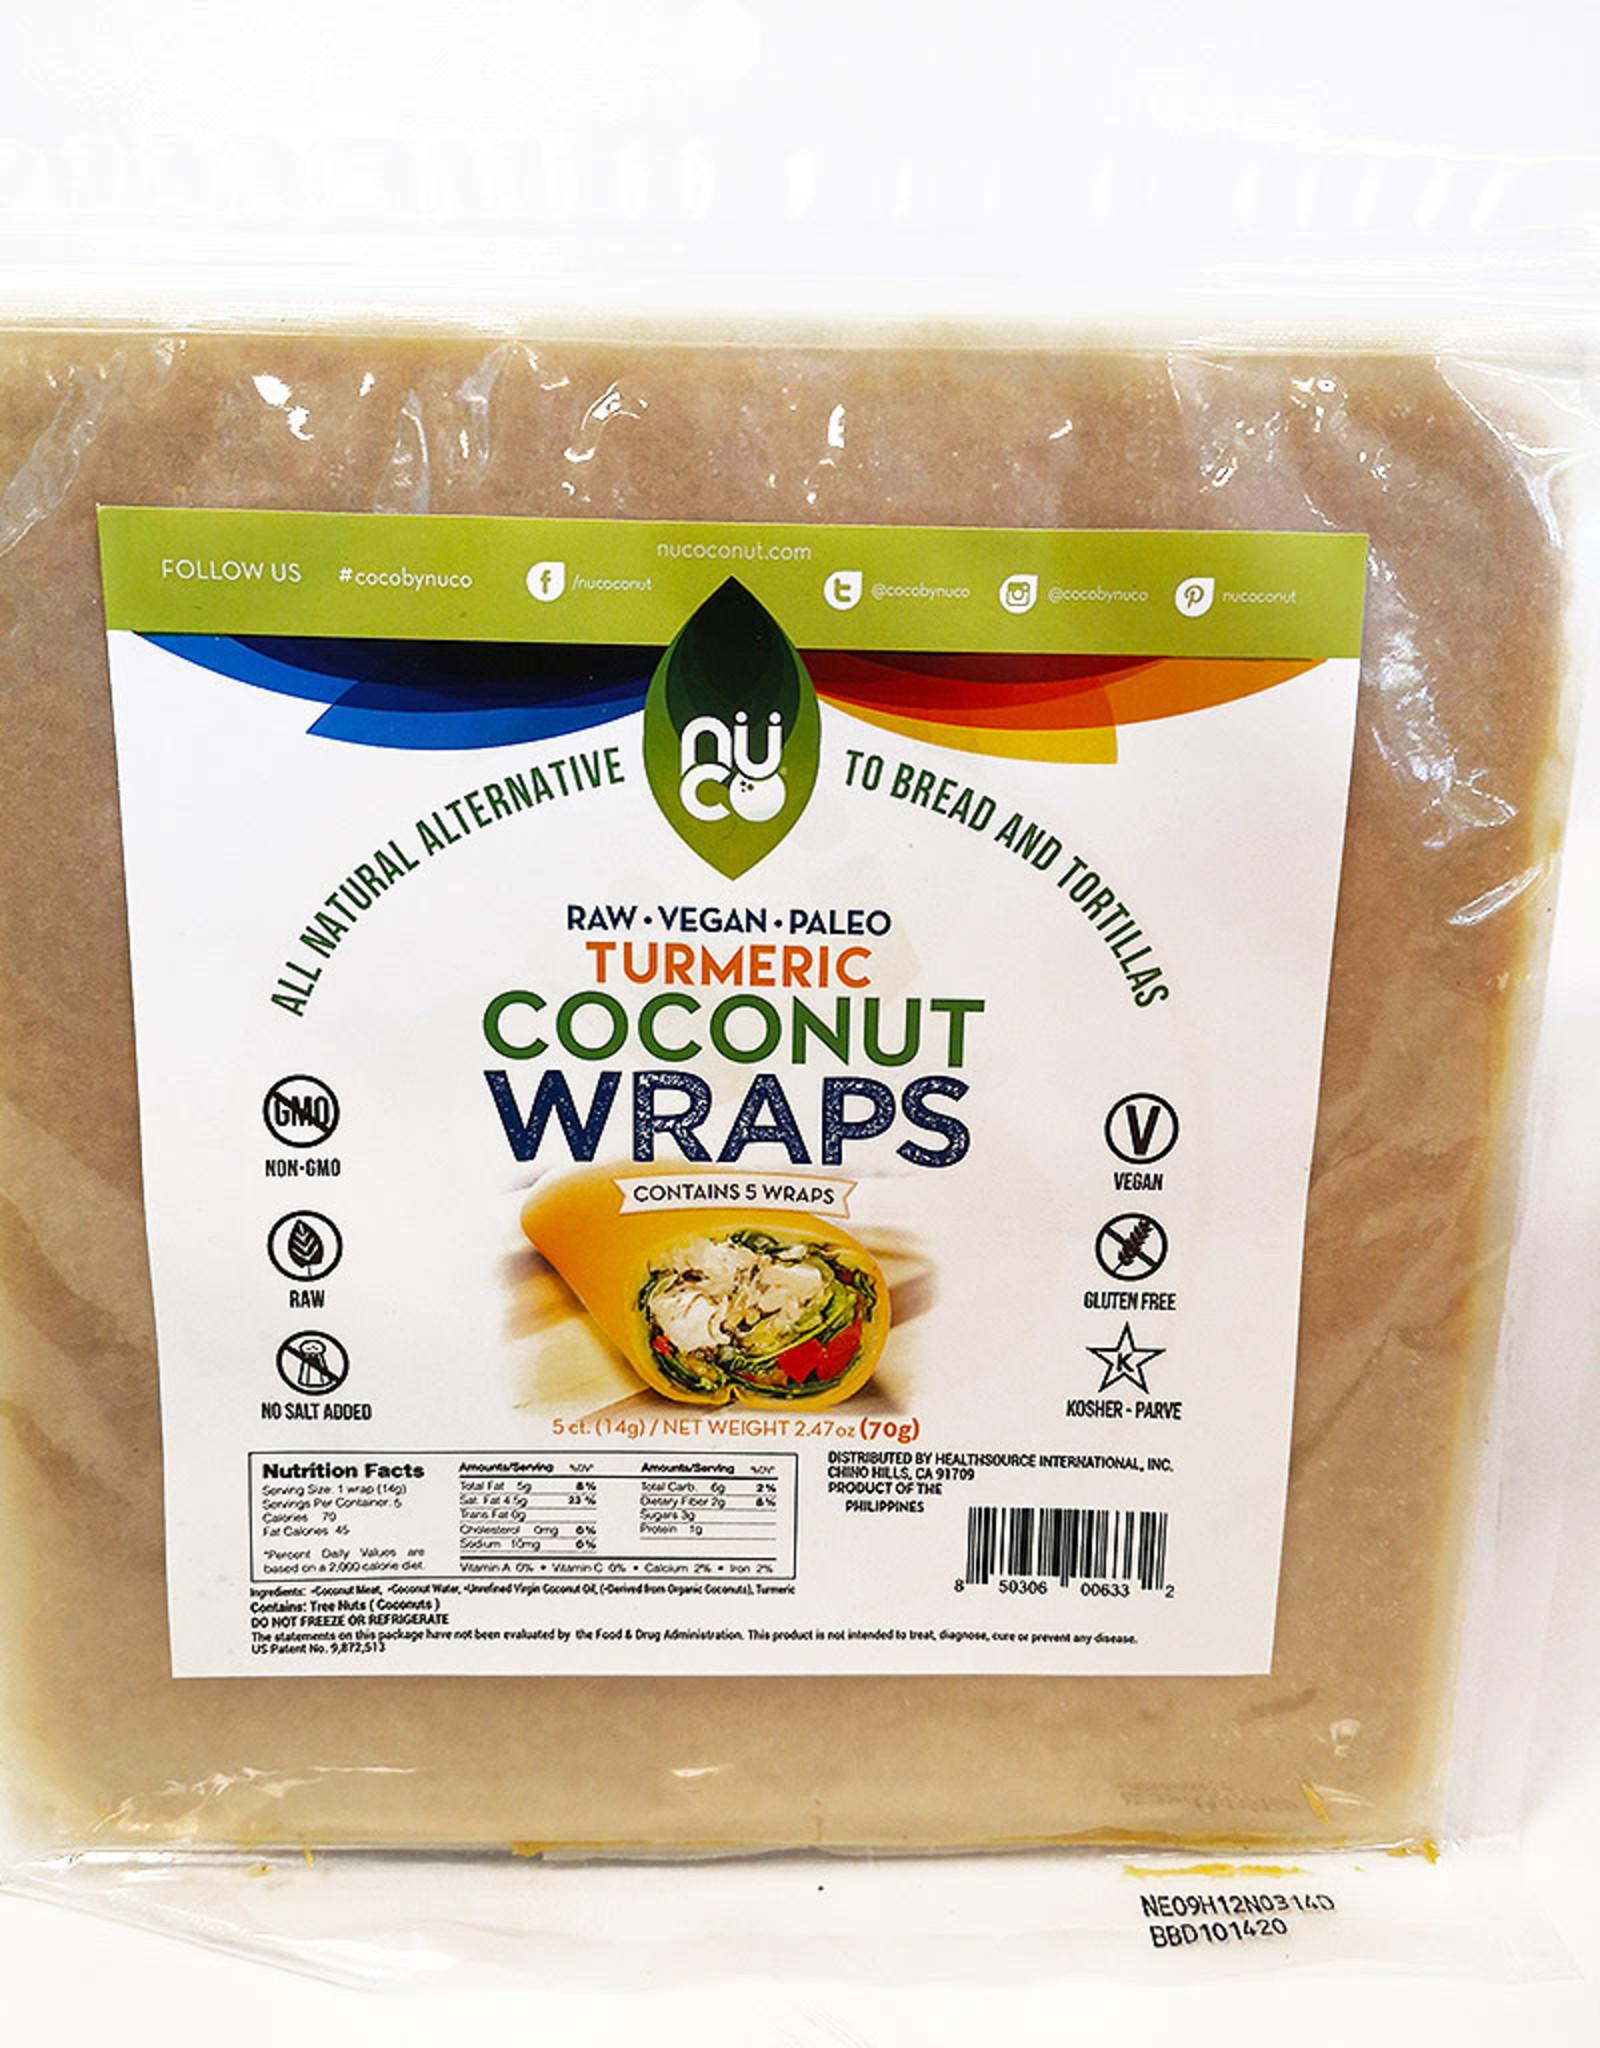 Nuco Nuco - Coconut Wraps, Turmeric (5pk)